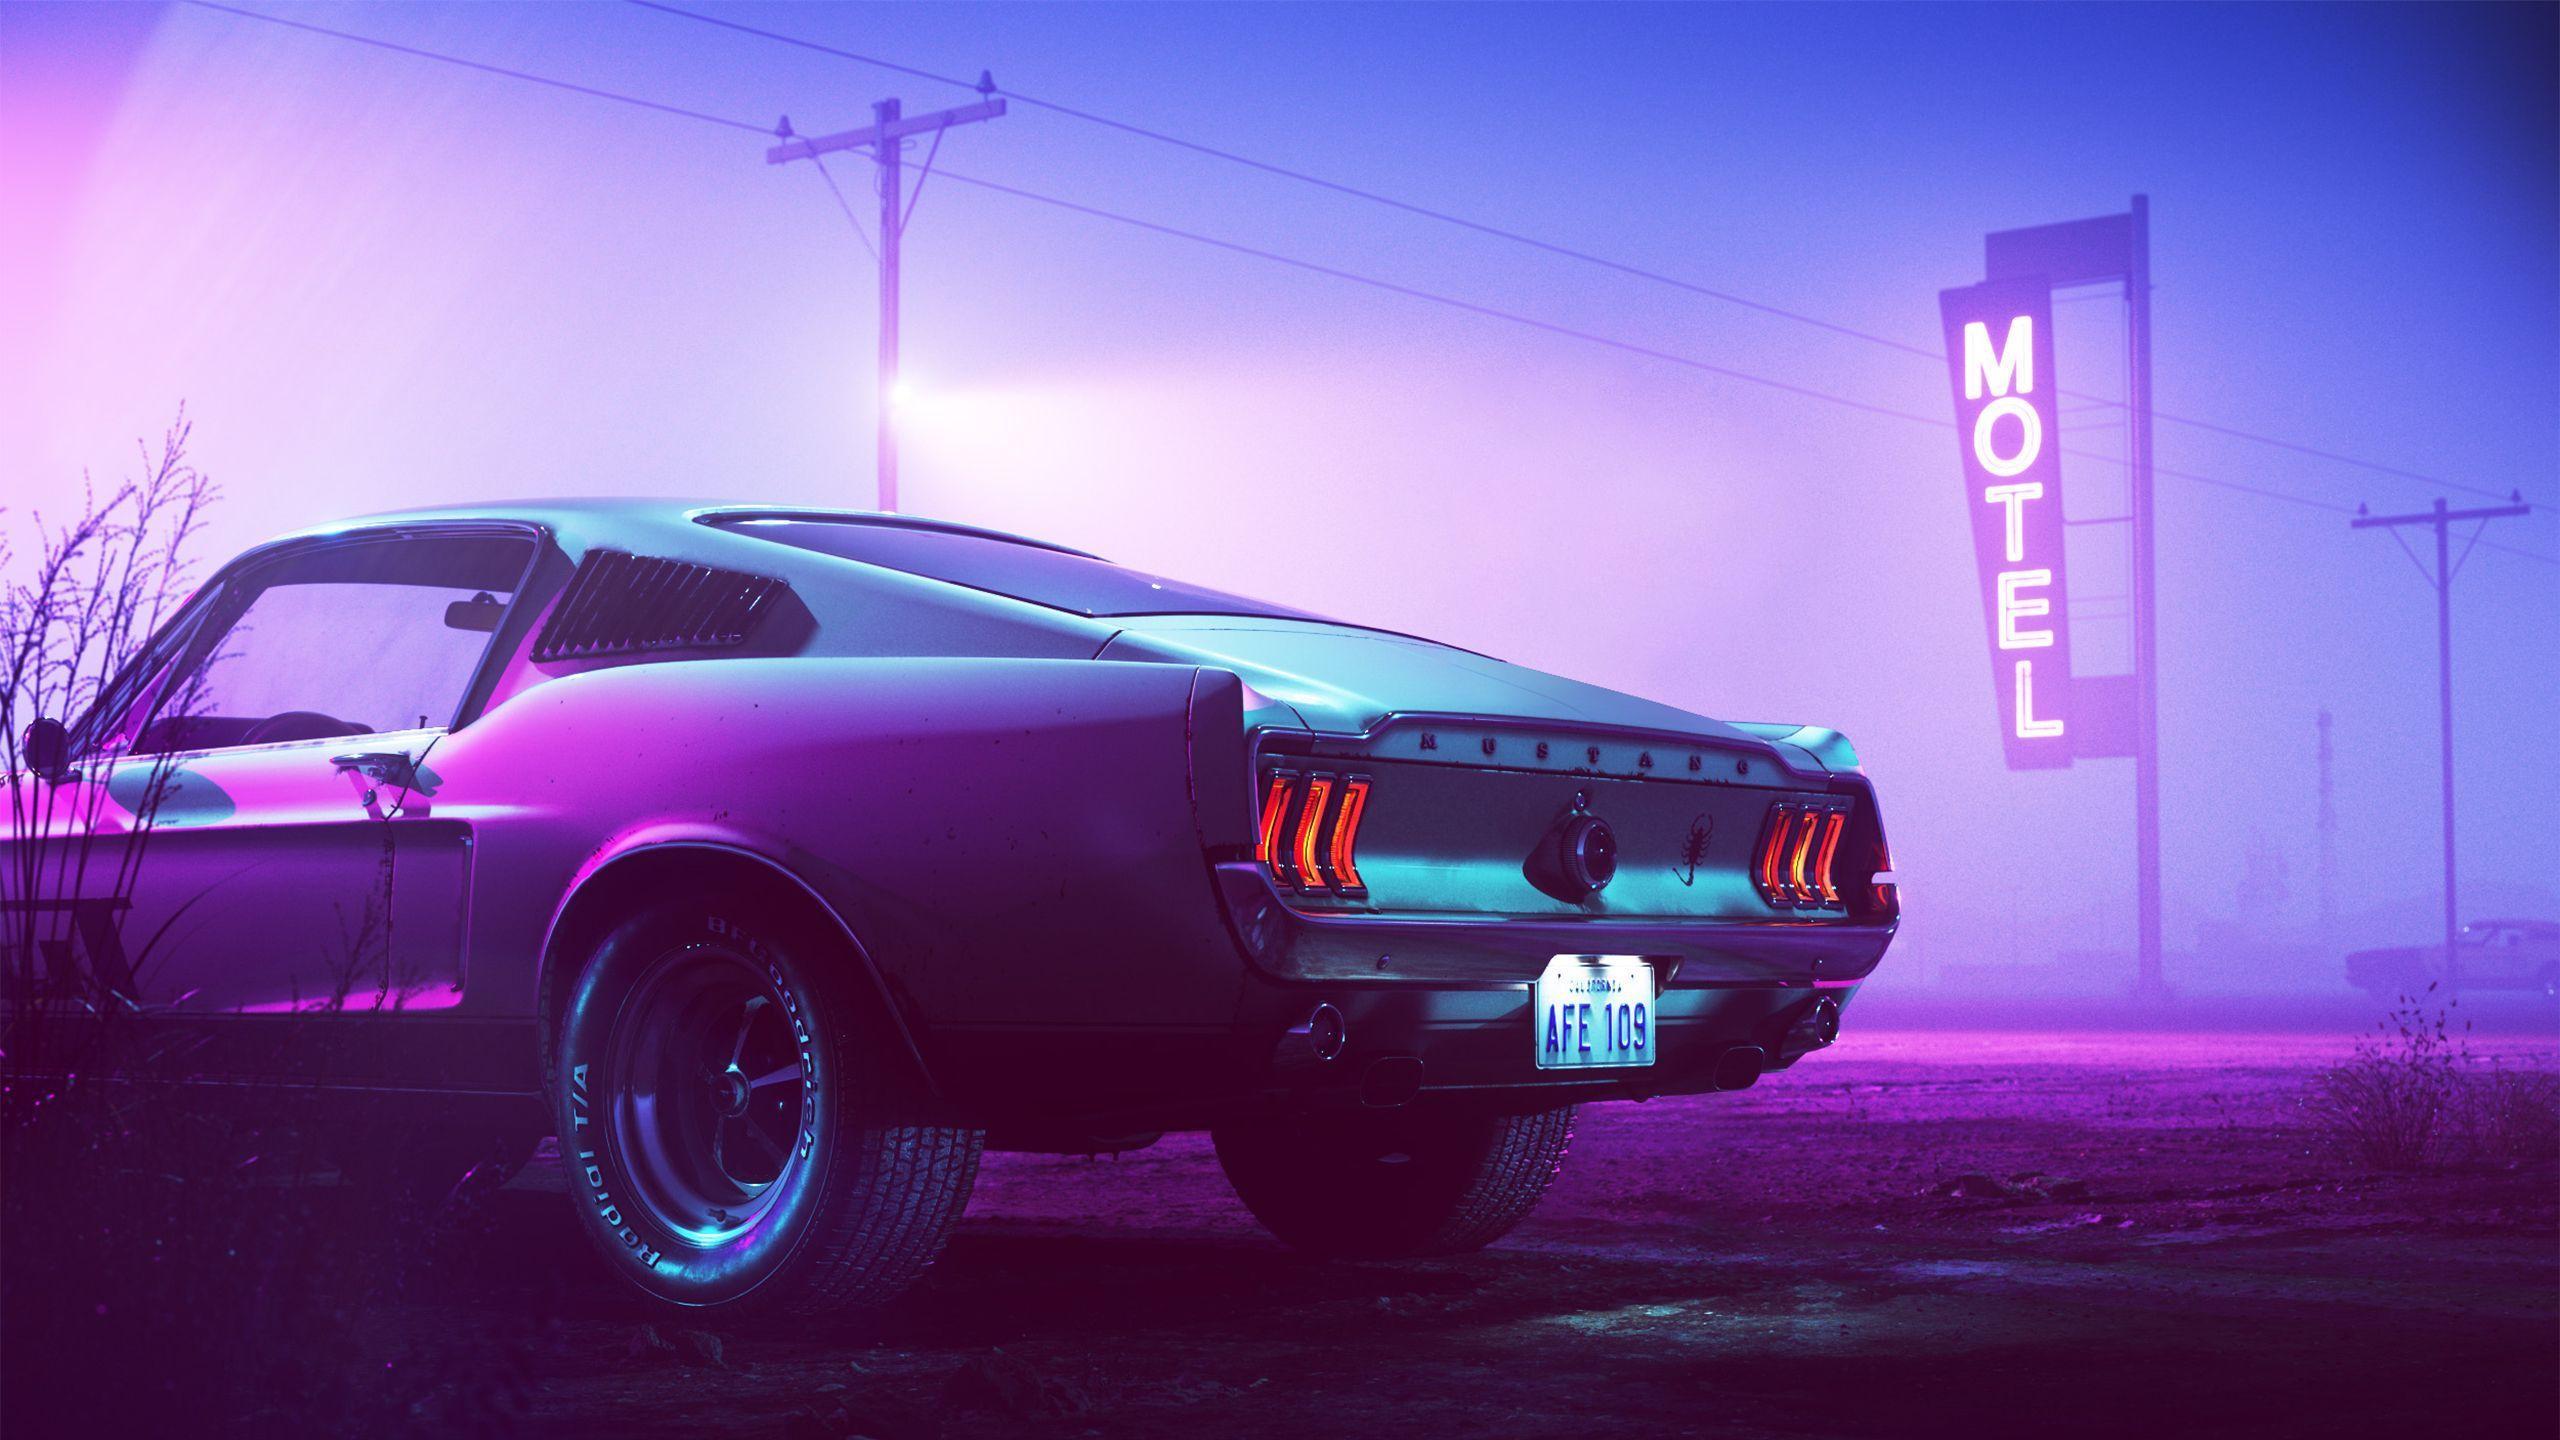 Neon Mustang Wallpapers Top Free Neon Mustang Backgrounds Wallpaperaccess